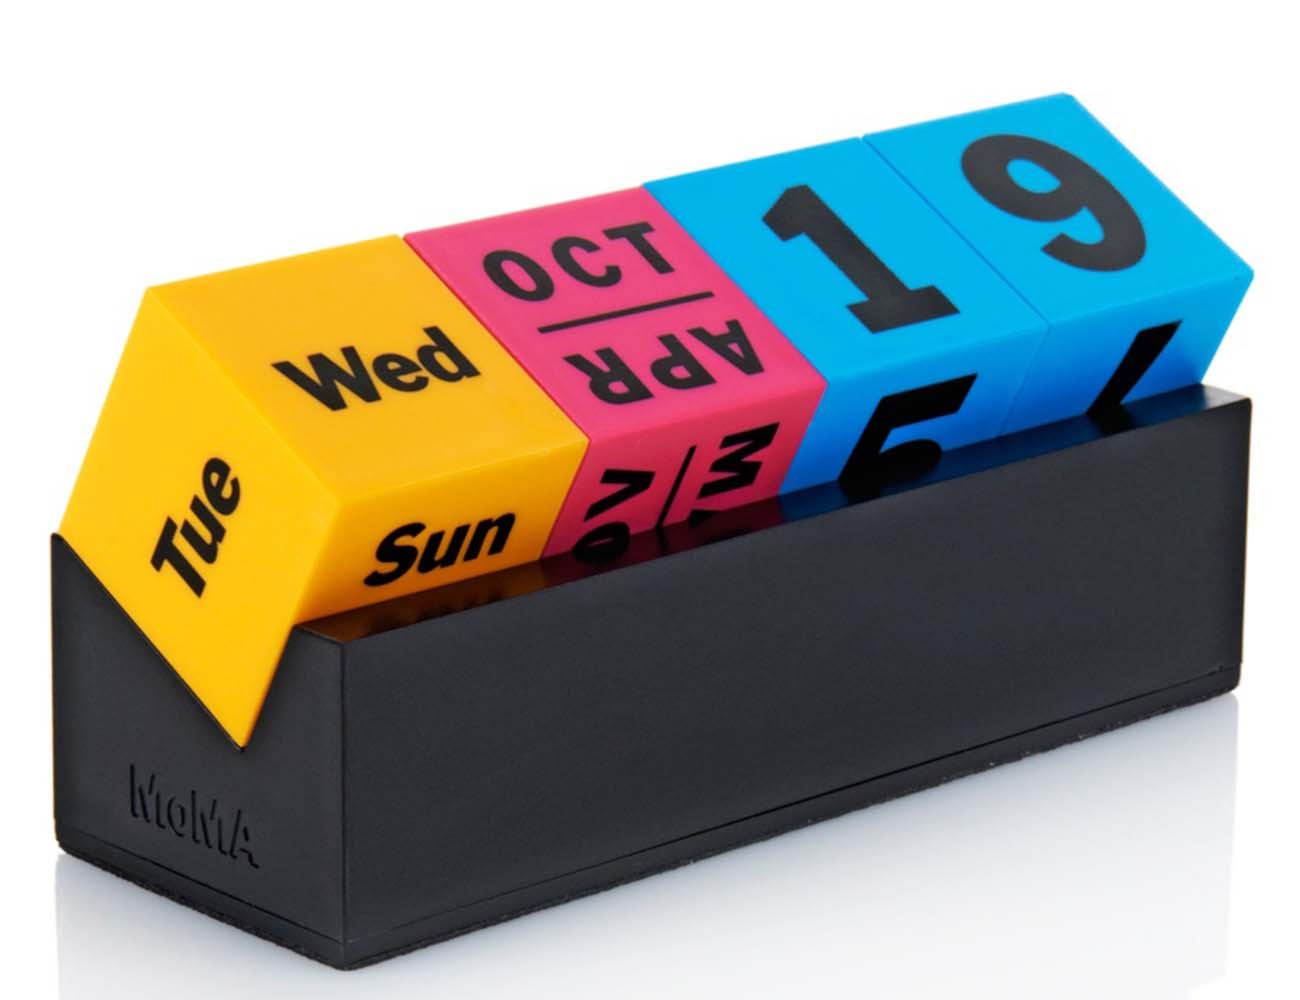 Perpetual Calendar Cube : Moma cubes perpetual calendar review the gadget flow